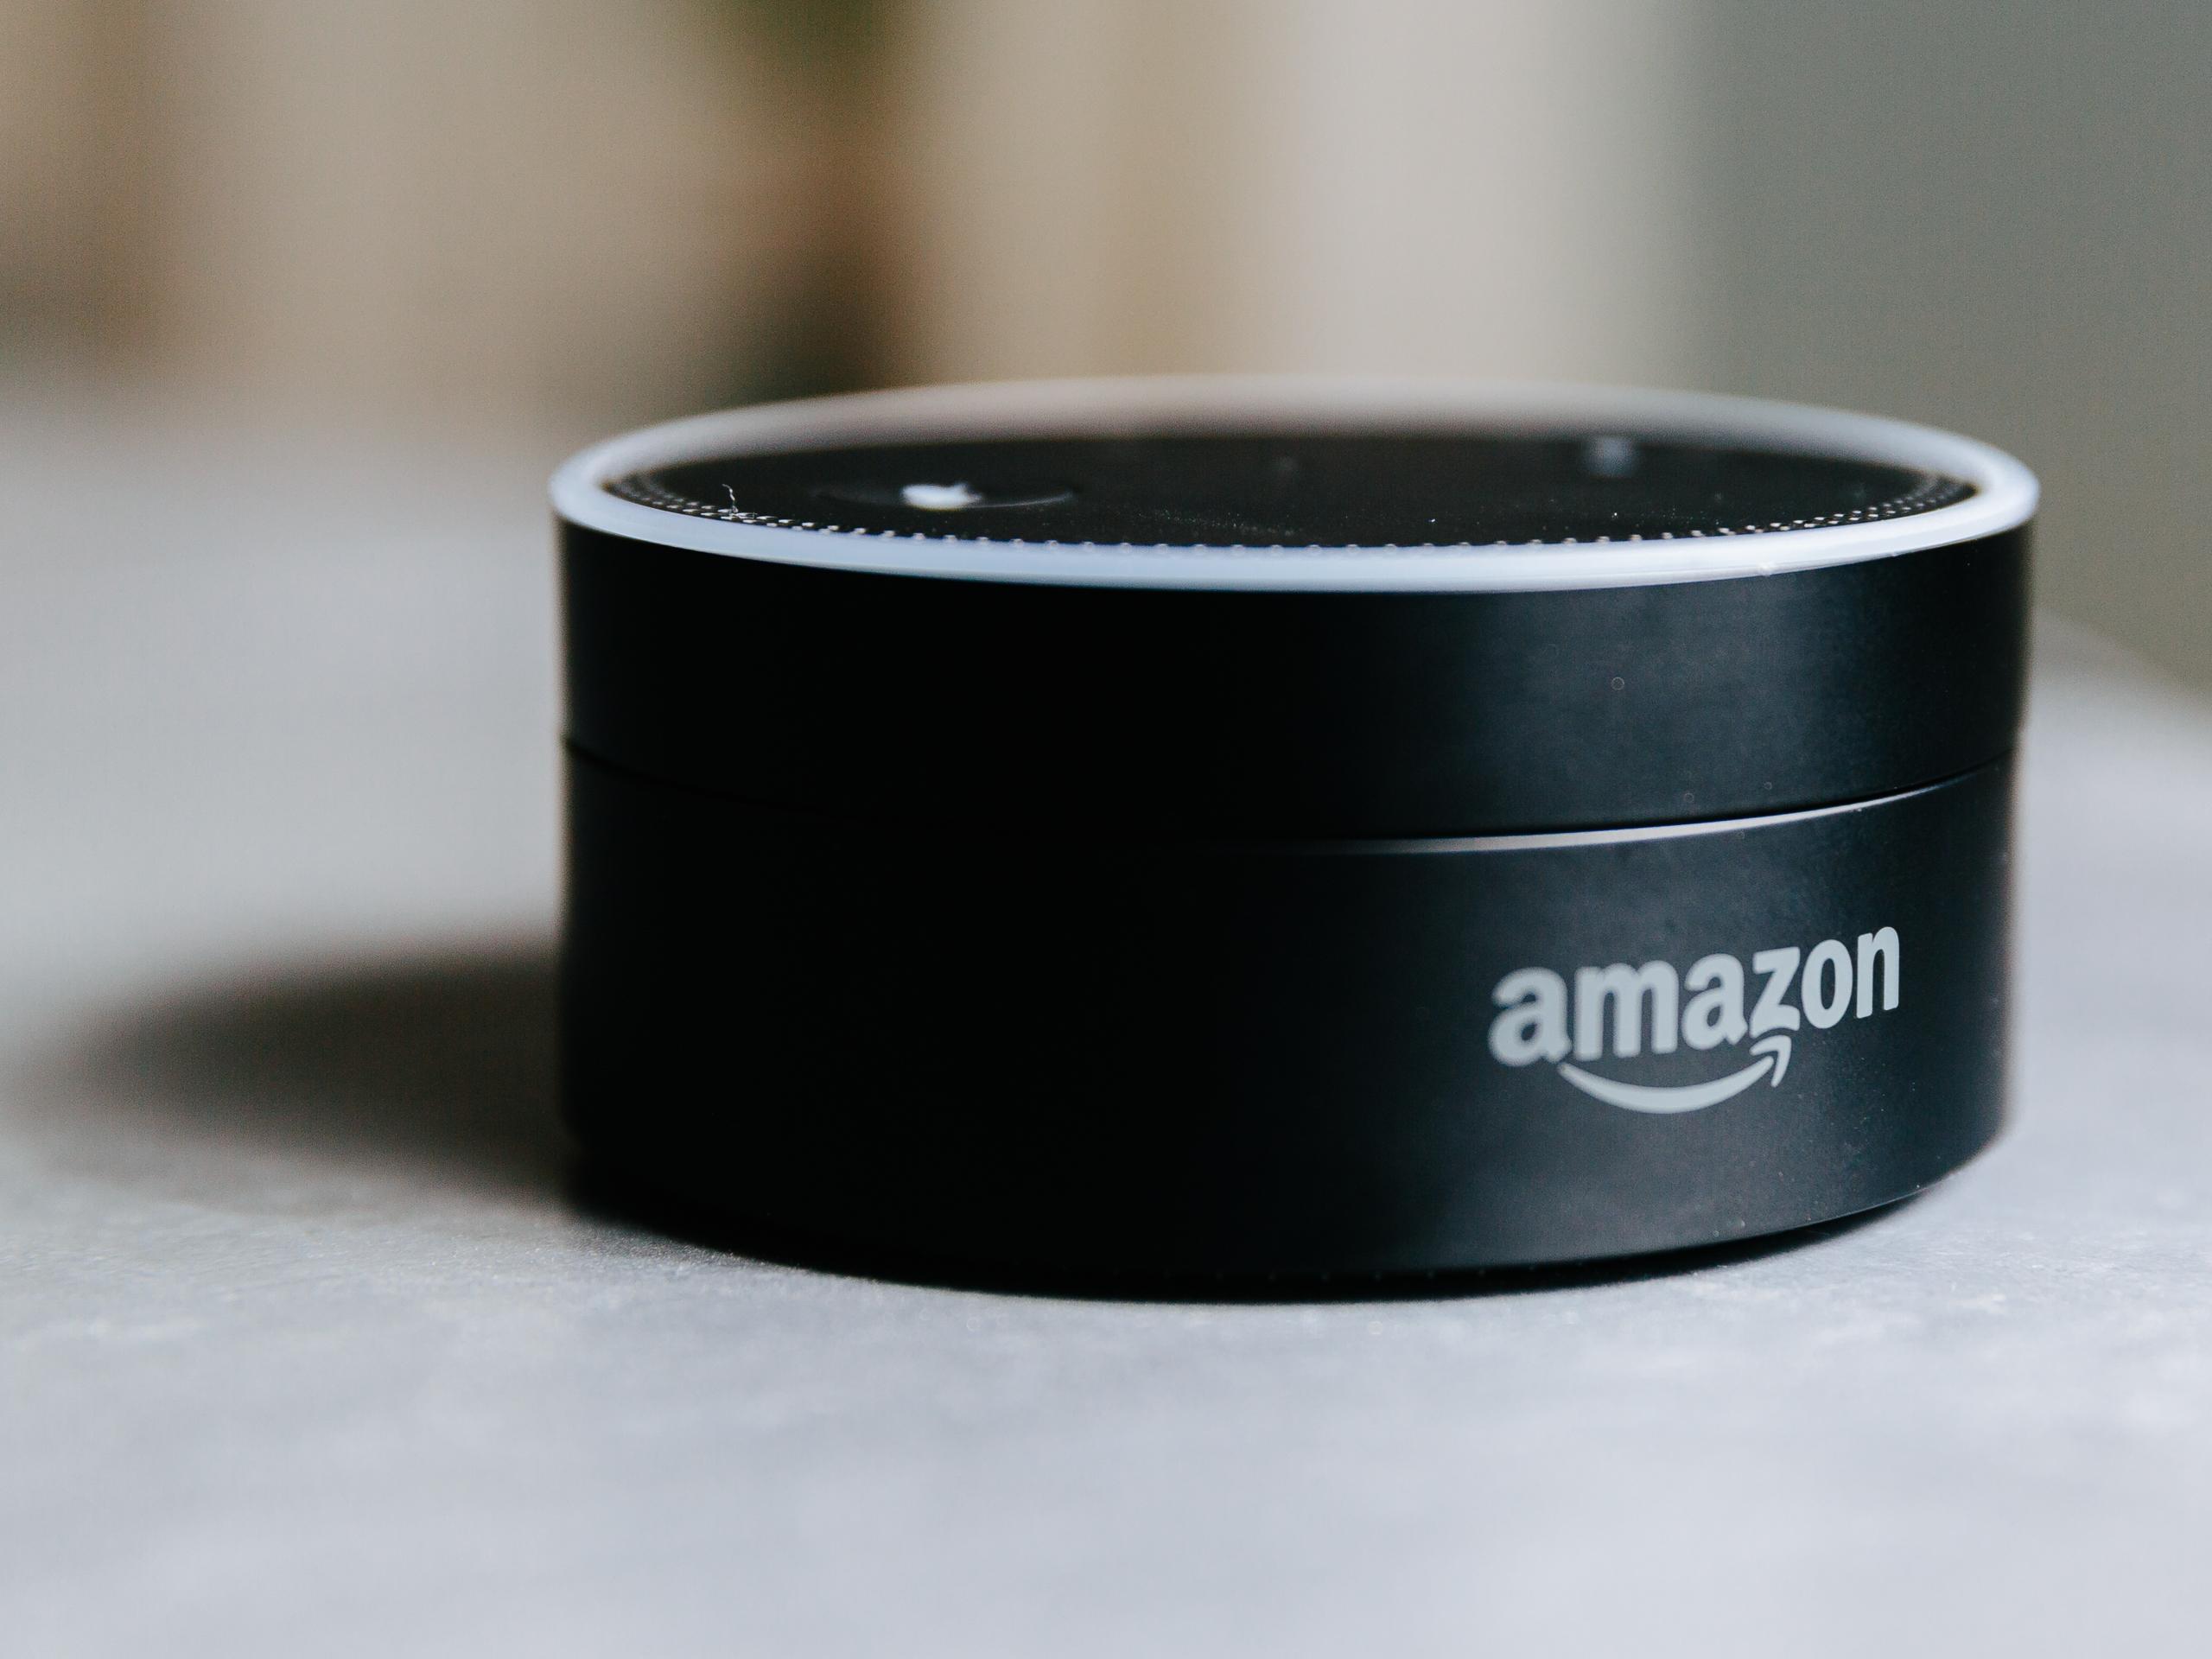 amazon-echo-dot-product-photos-1.jpg